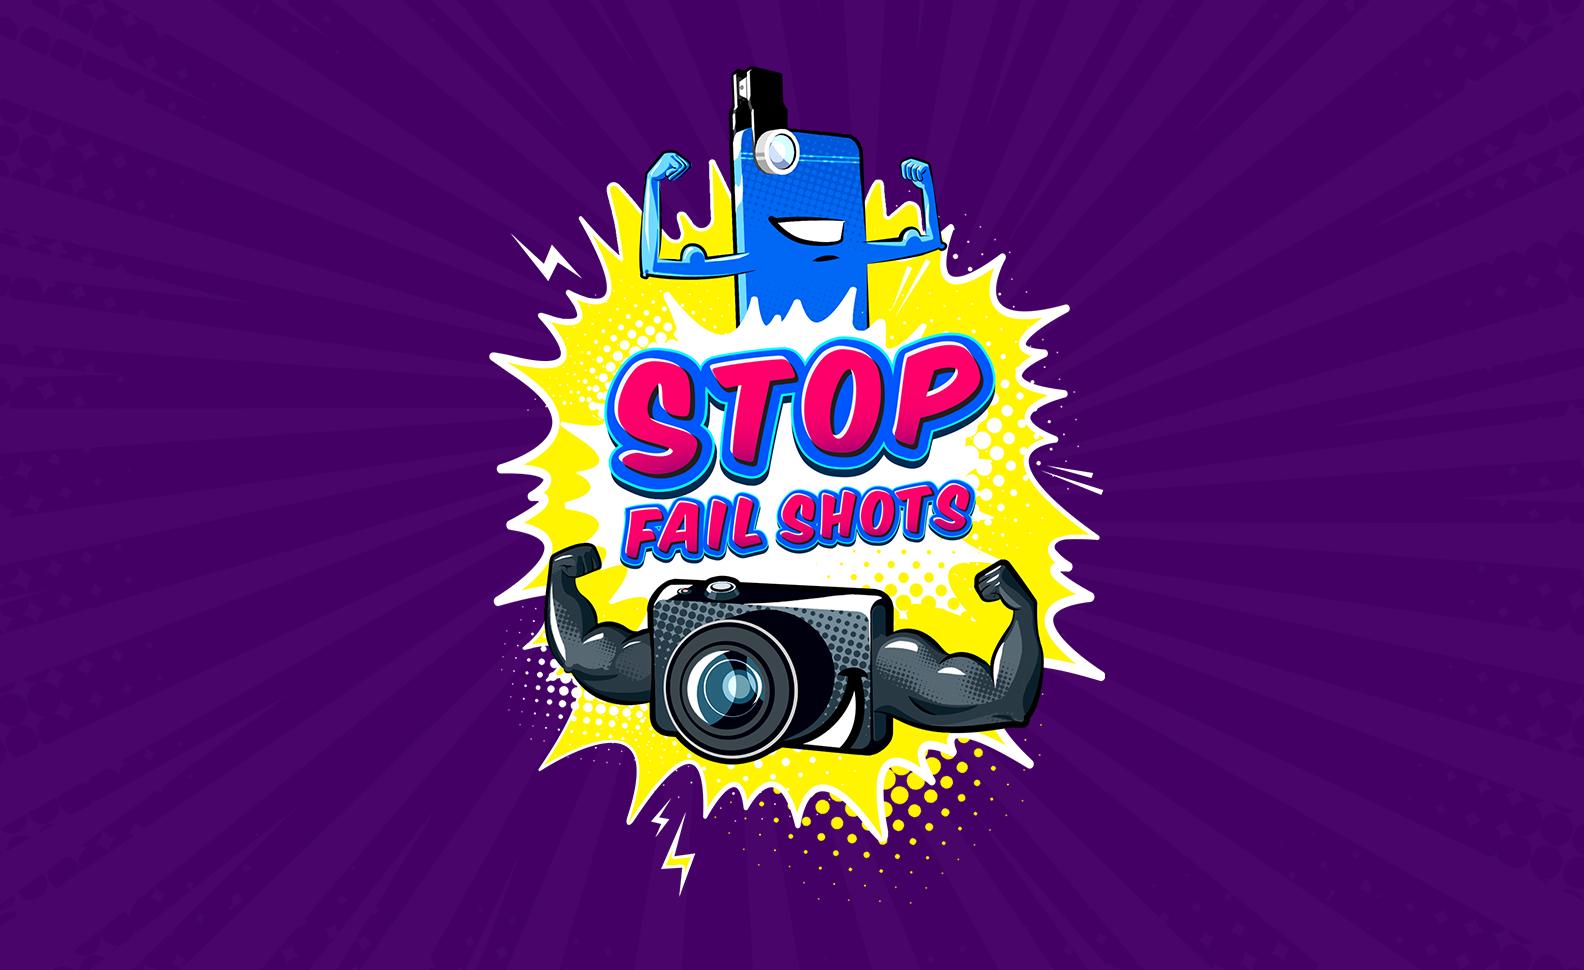 Stop Fail Shots